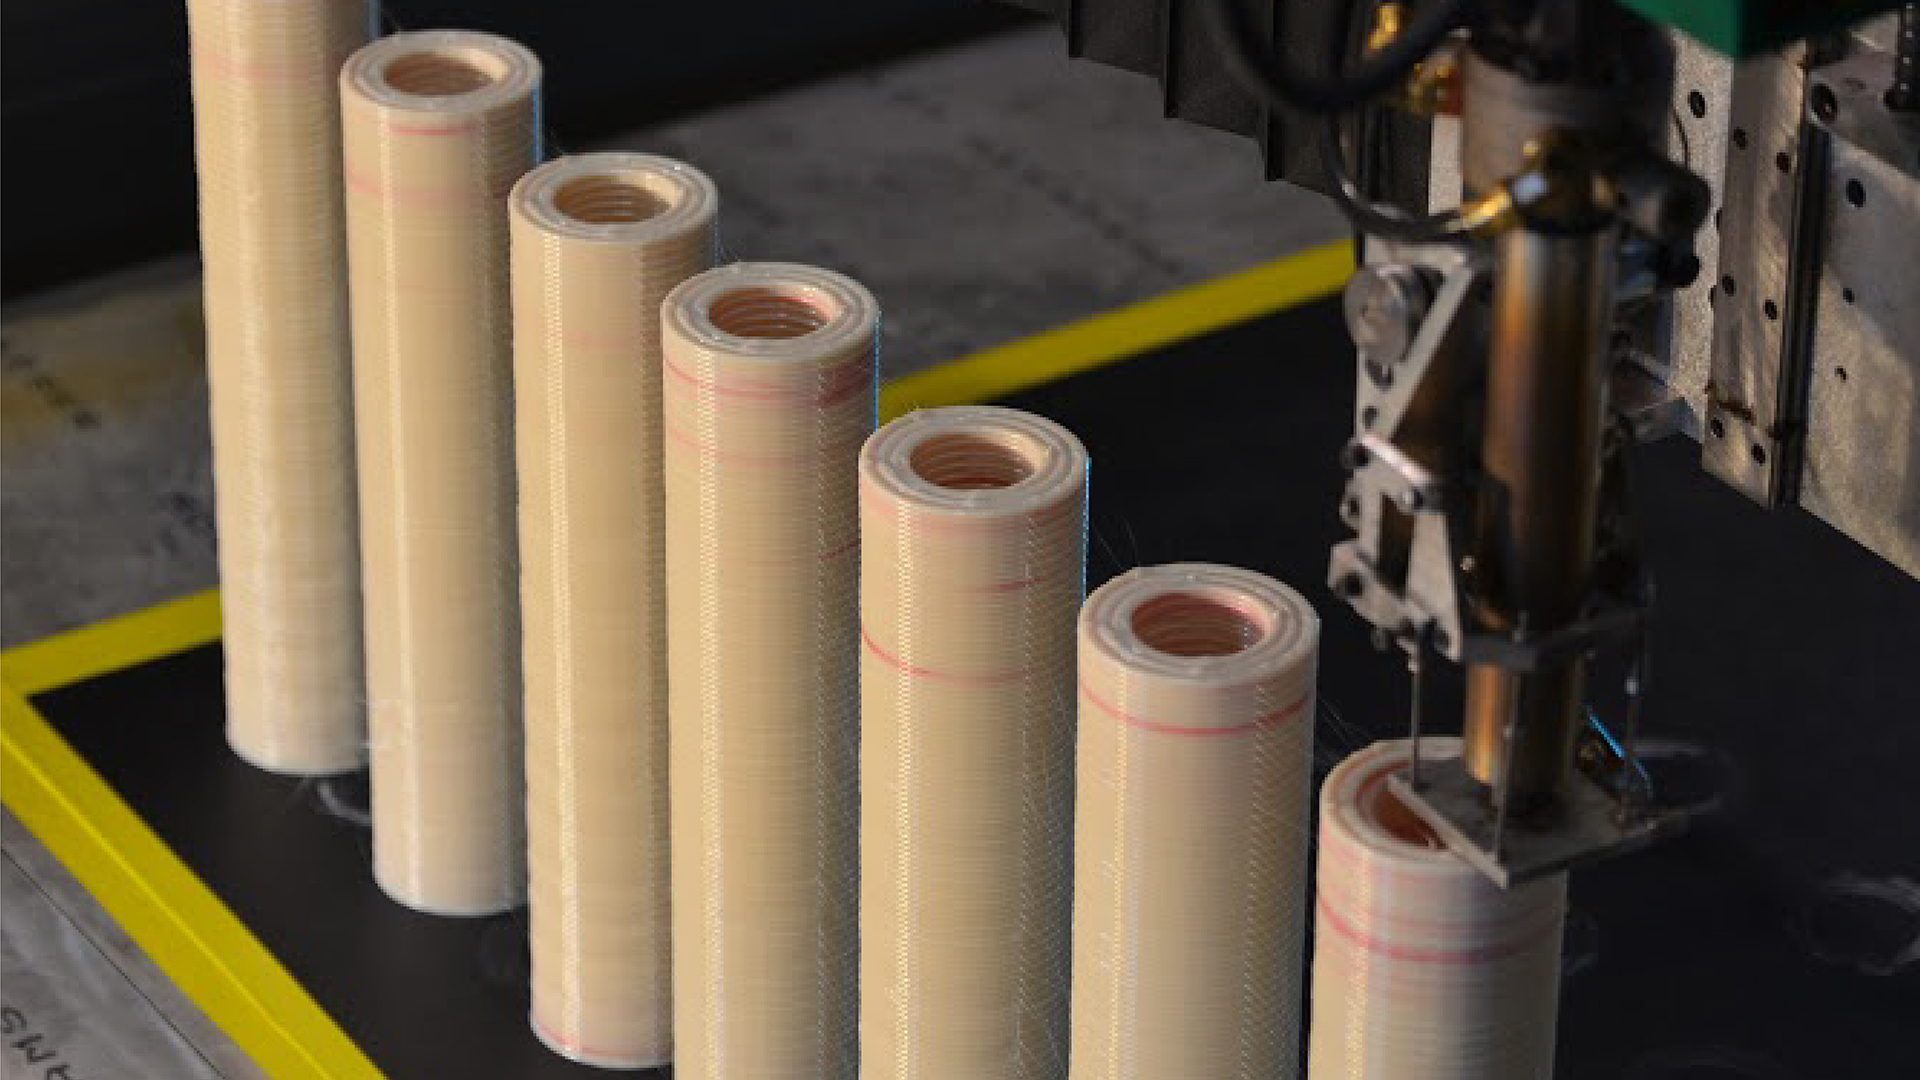 Firehawk's 3D printed solid rocket fuel rods. Photo via Firehawk Aerospace.